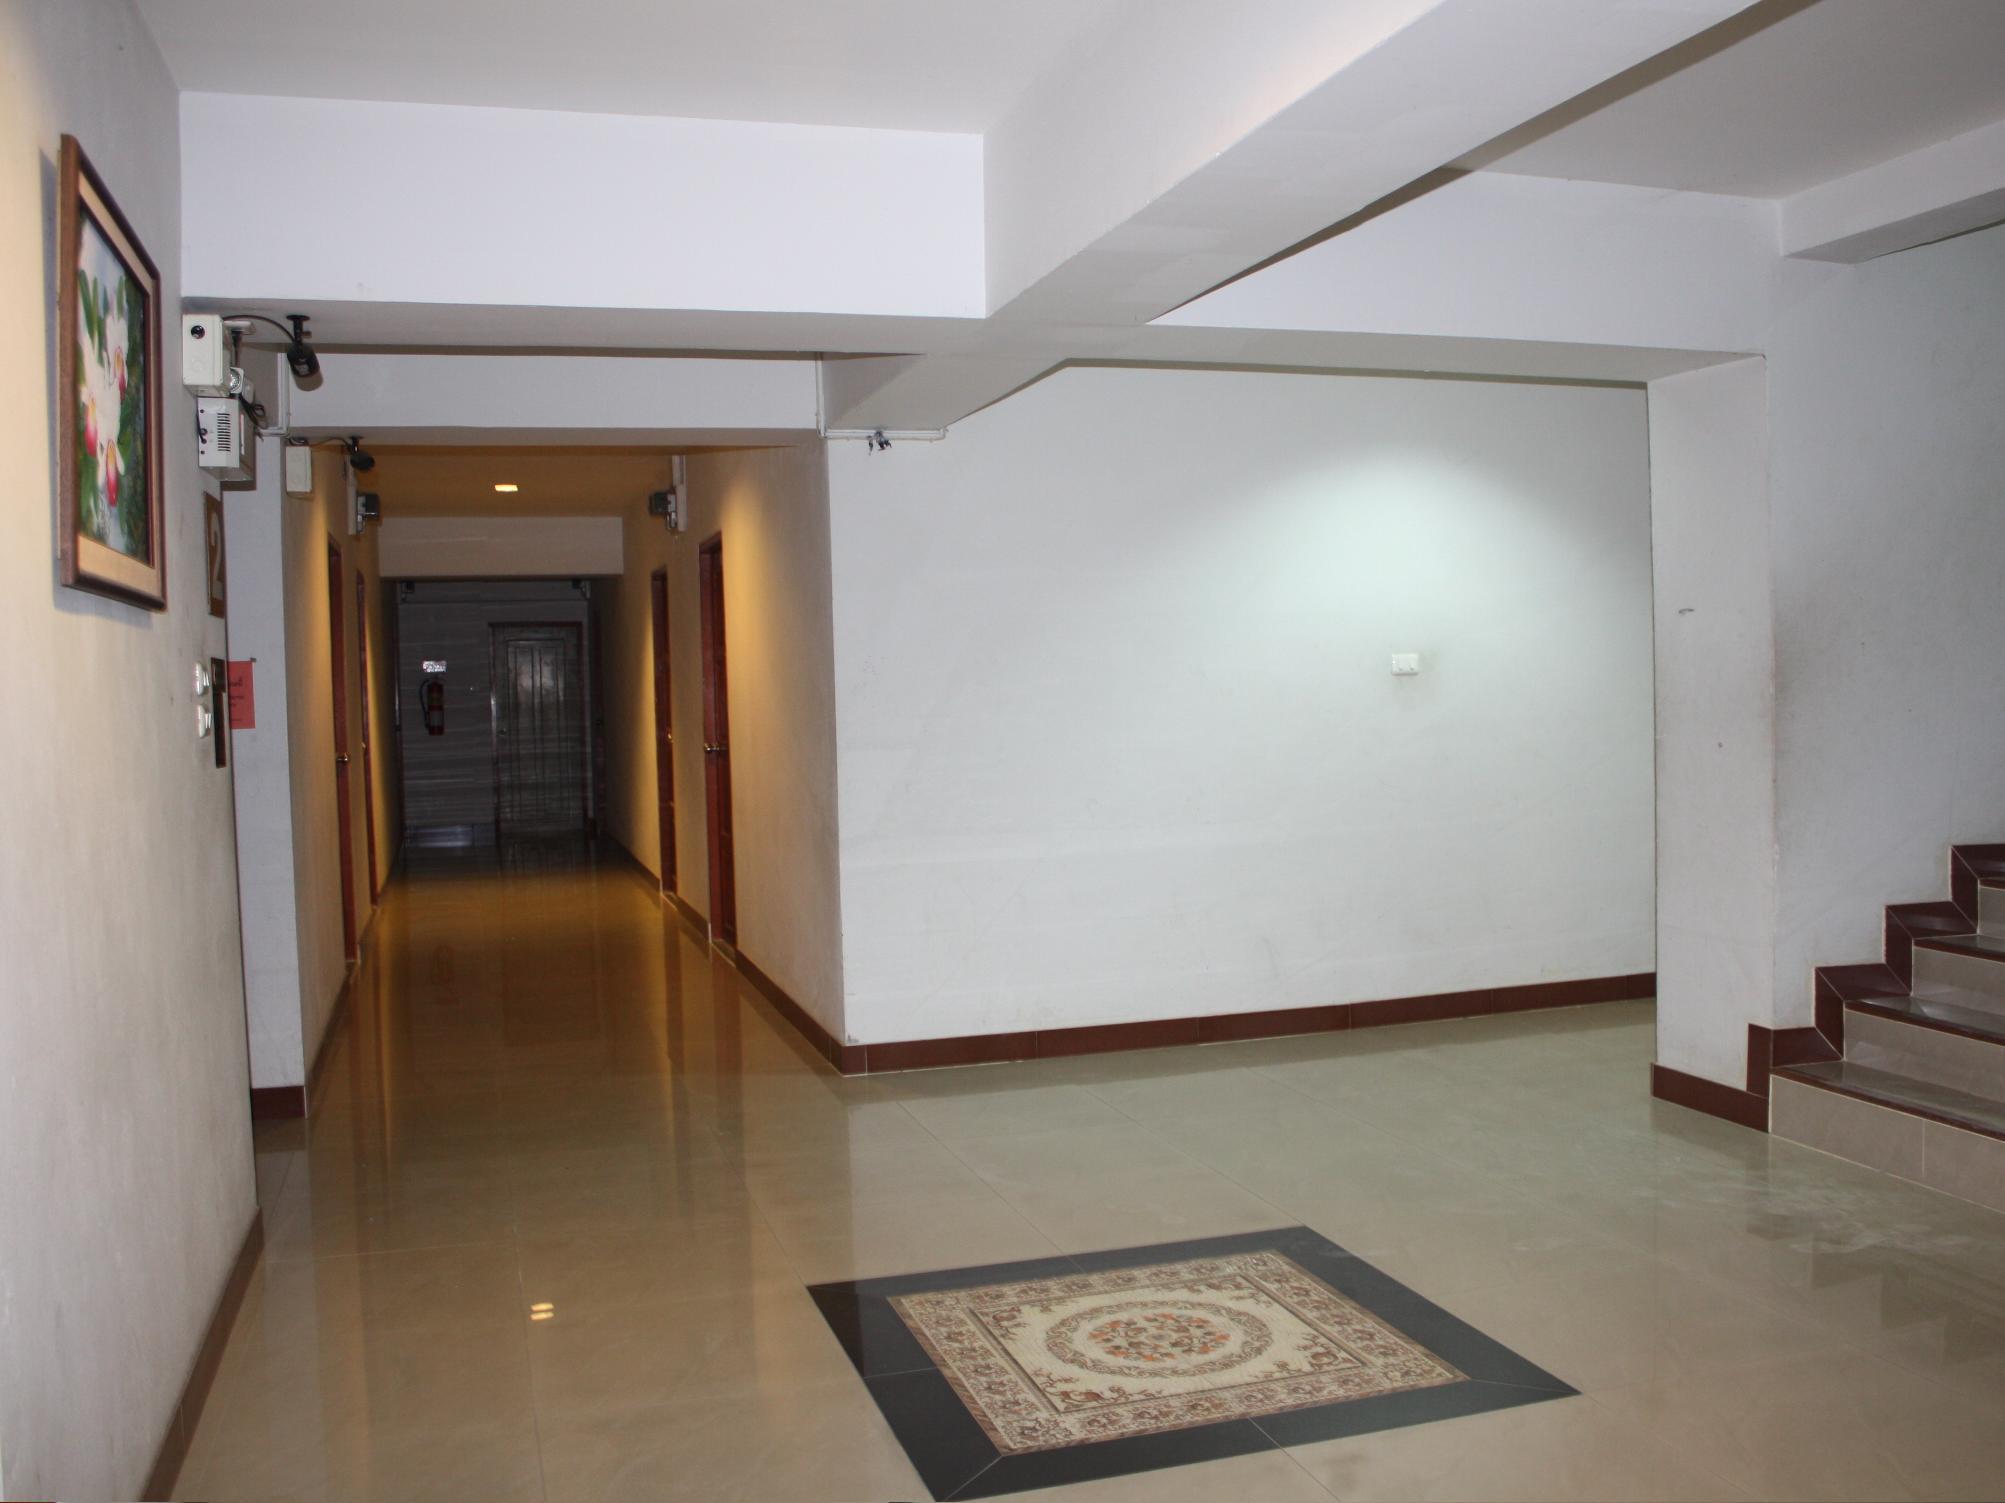 Tamarind Residences Serviced Apartment,แทมมารินด์ เรสซิเดนซ์ เซอร์วิส อพาร์ตเมนต์